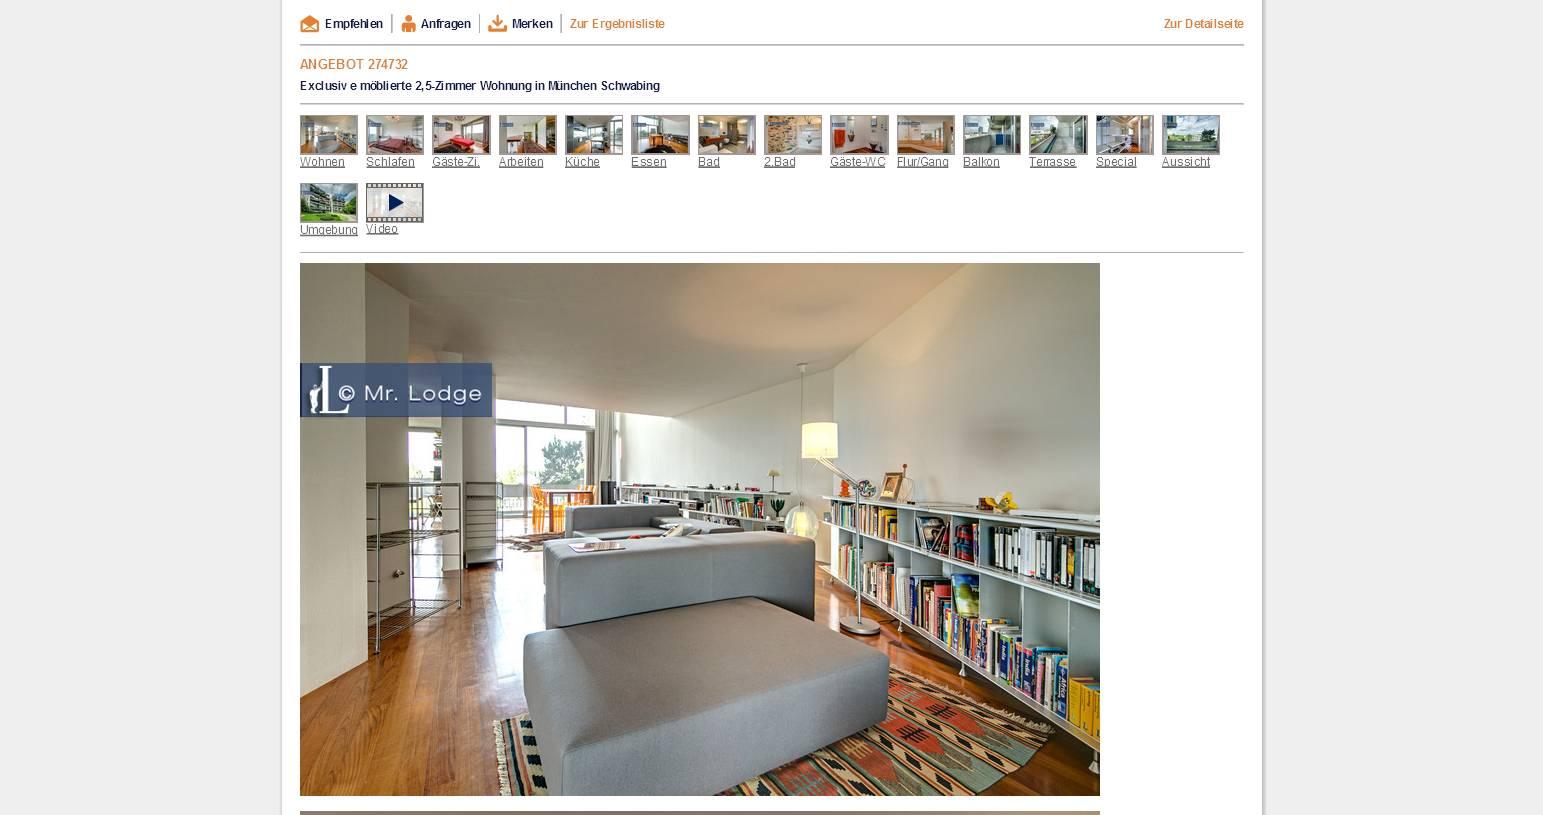 informationen ber wohnungsbetrug informations about rental scam seite 9. Black Bedroom Furniture Sets. Home Design Ideas